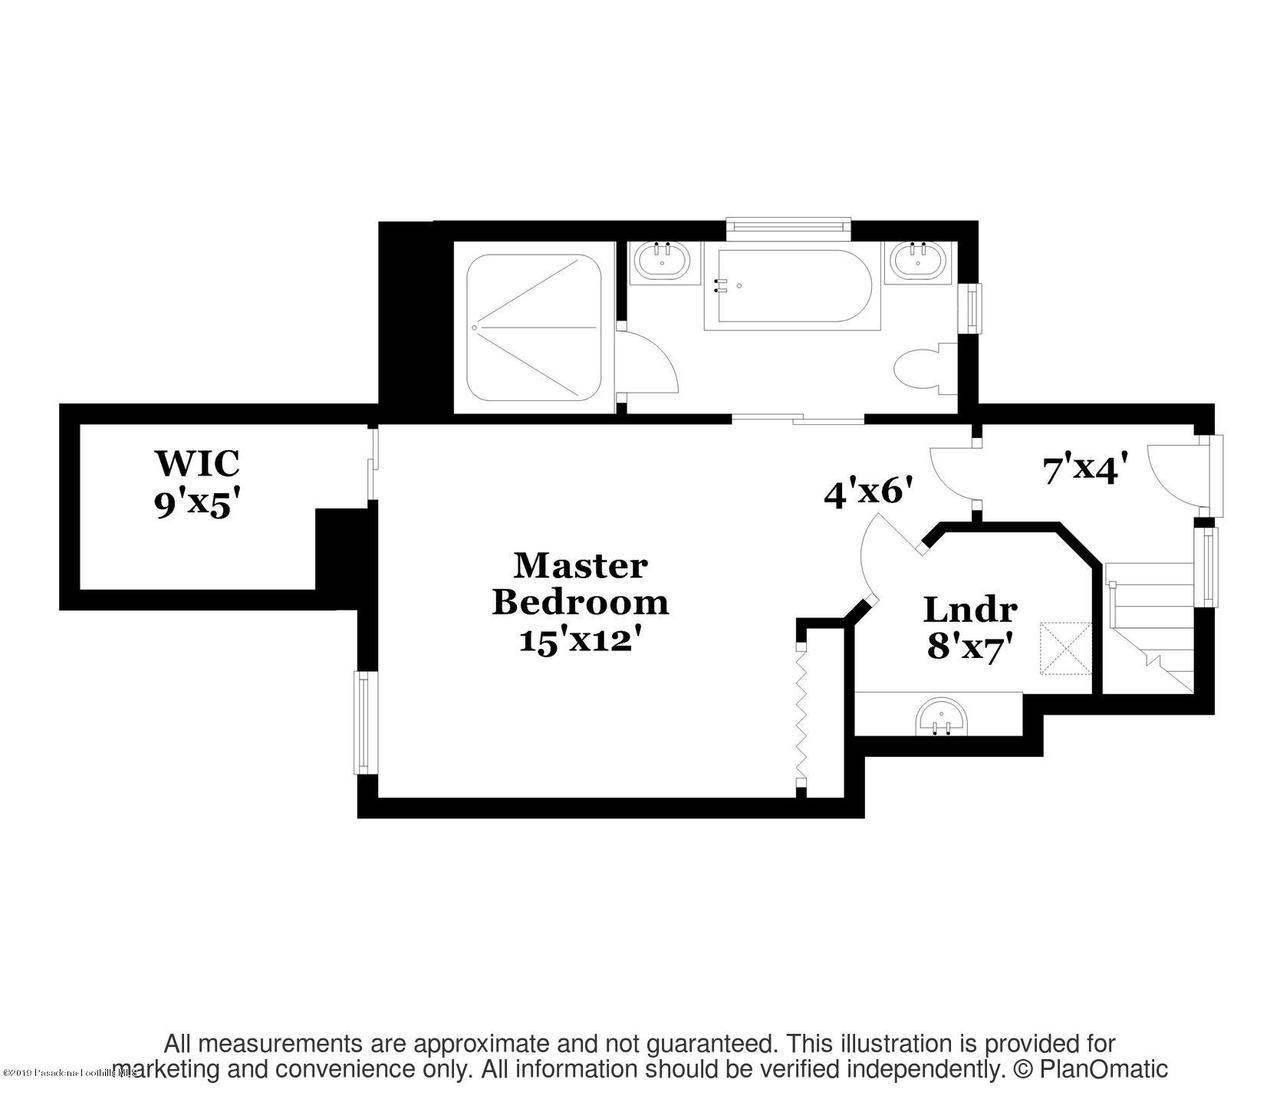 1654 GLEN AYLSA, Los Angeles (City), CA 90041 - floorplan-lower-394879